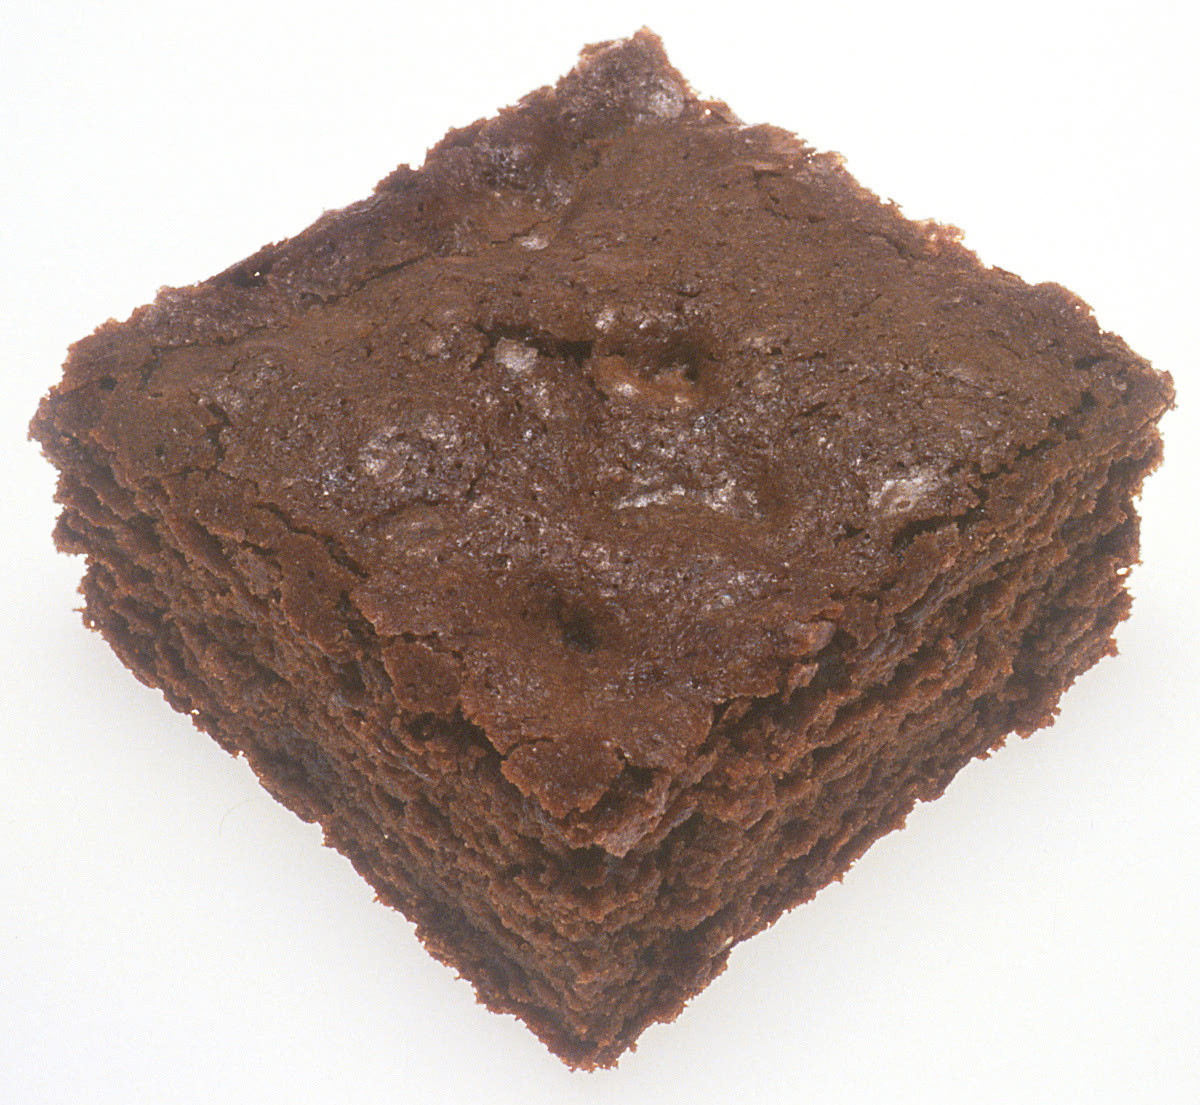 Chocolate Free Chocolate Brownies